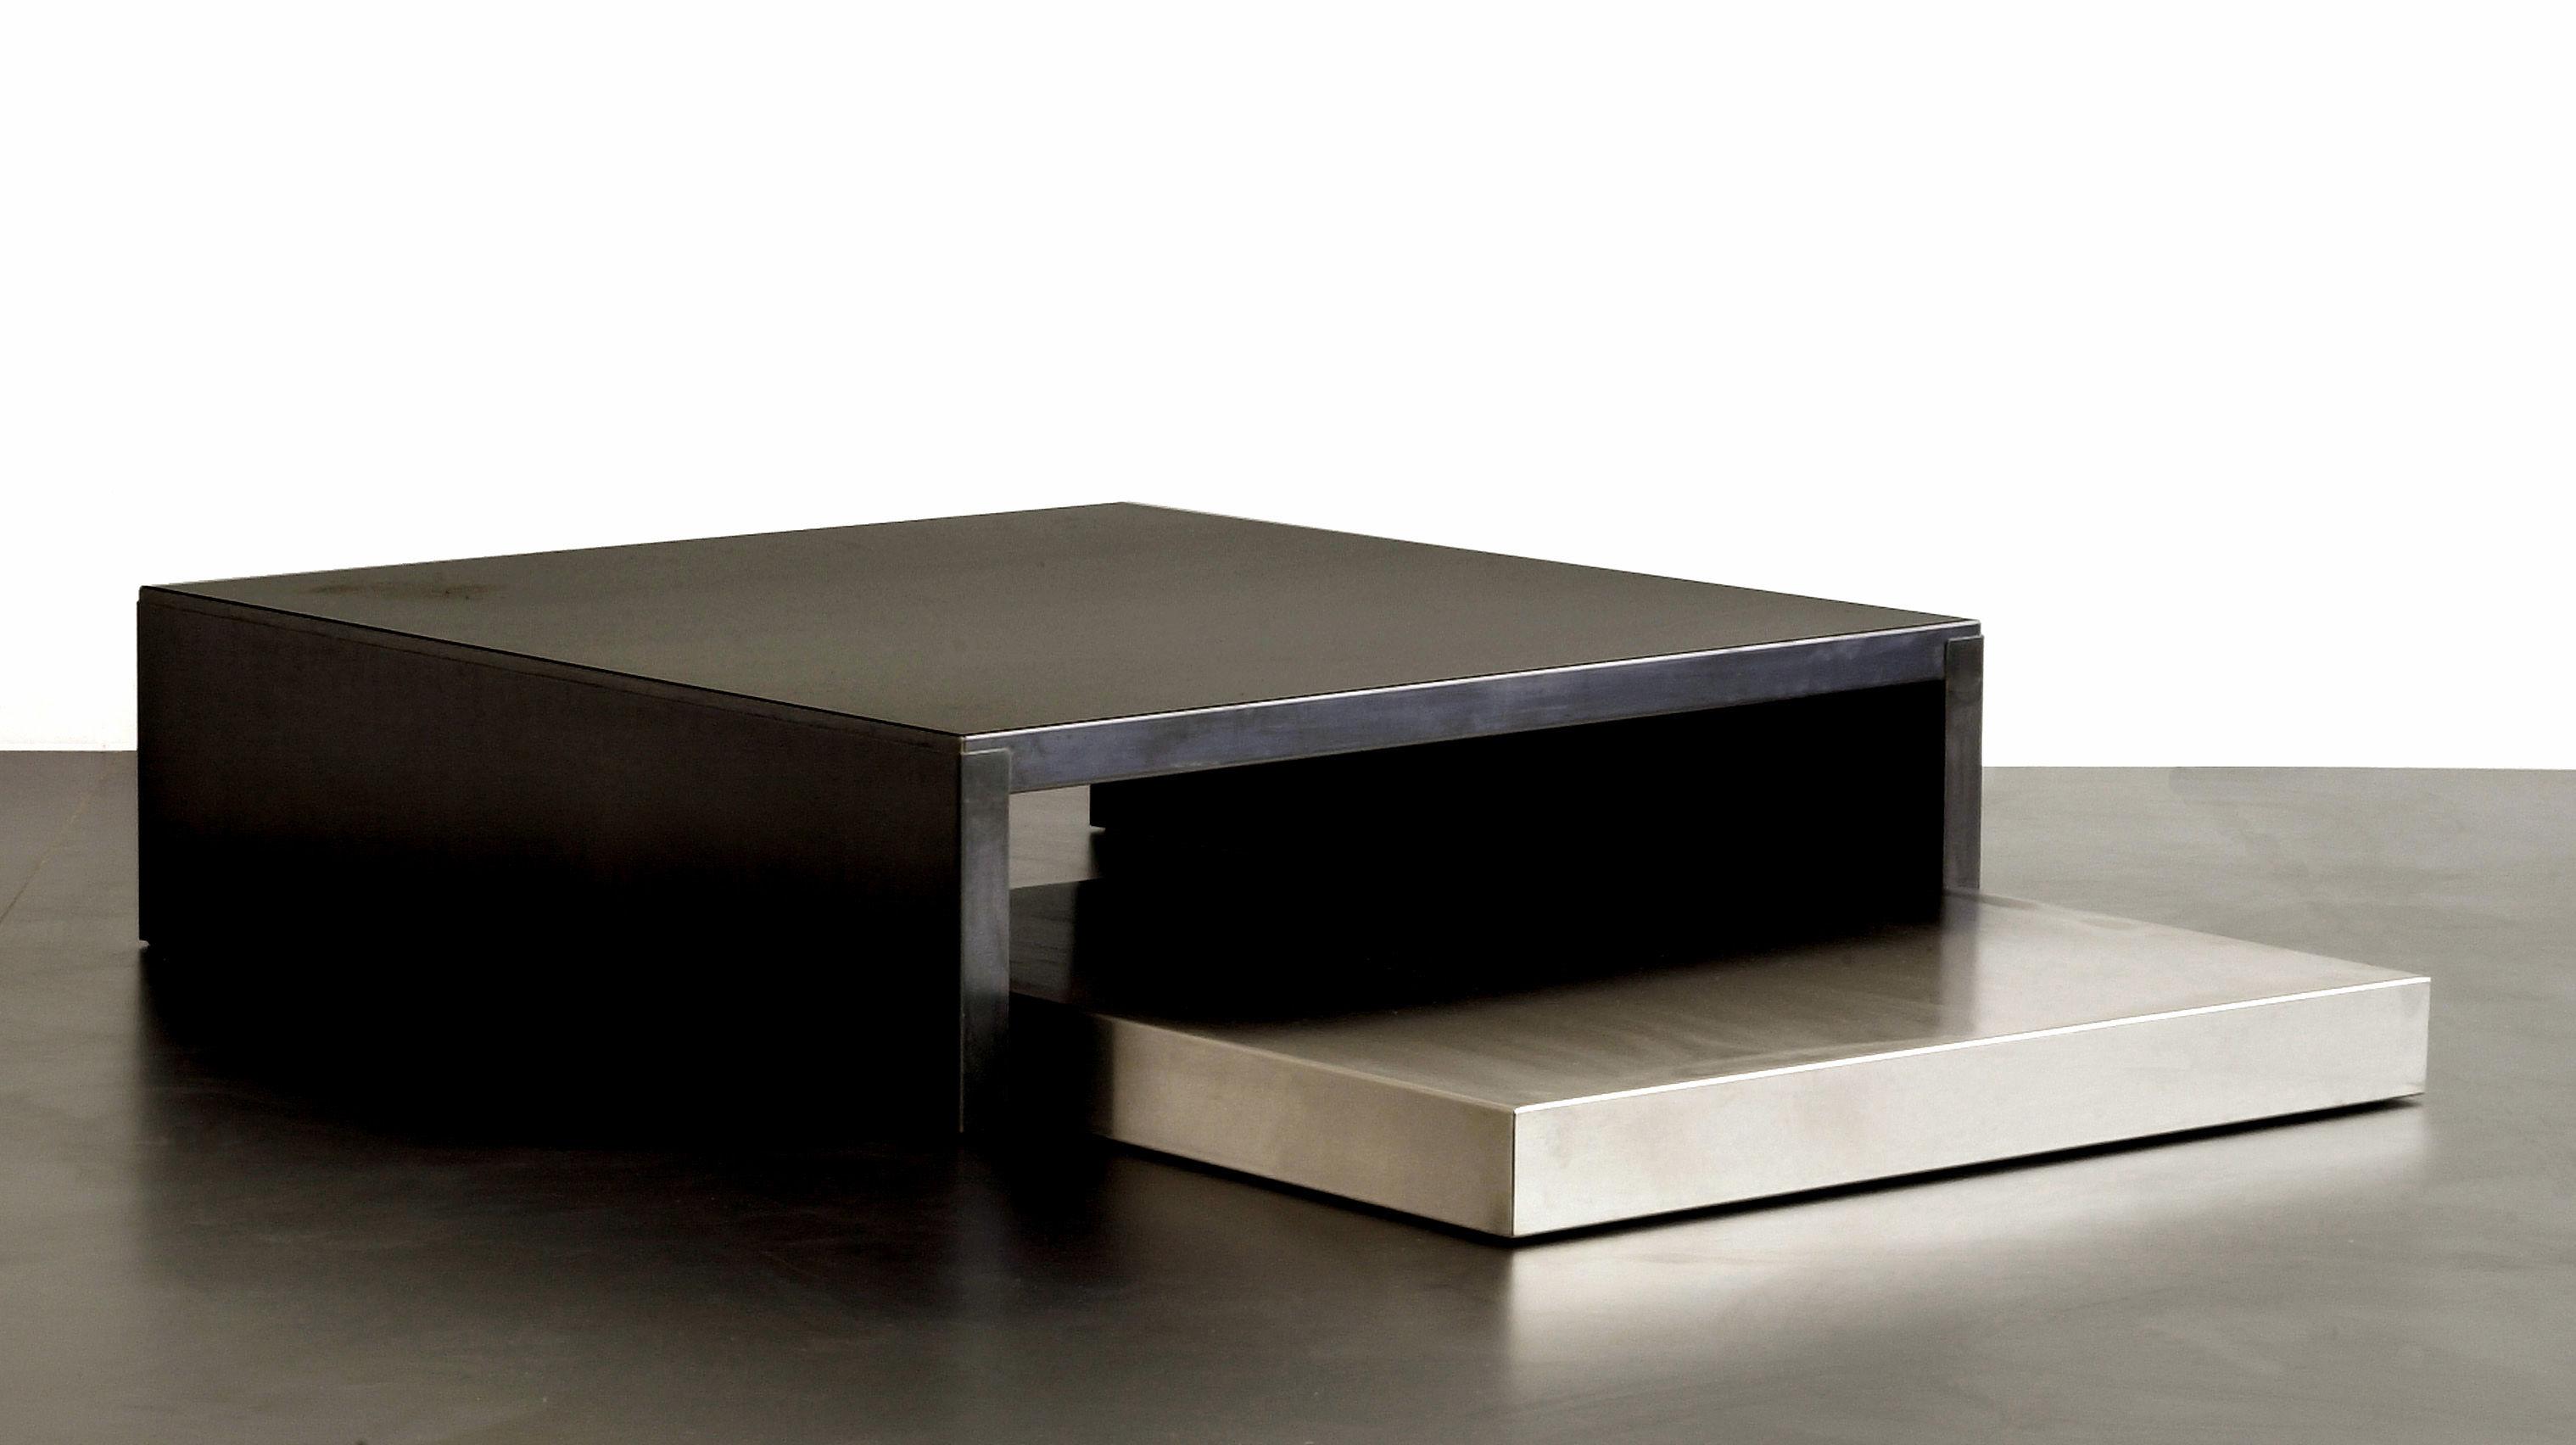 Table basse max moritz acier phosphat noir acier for Table basse 100x100